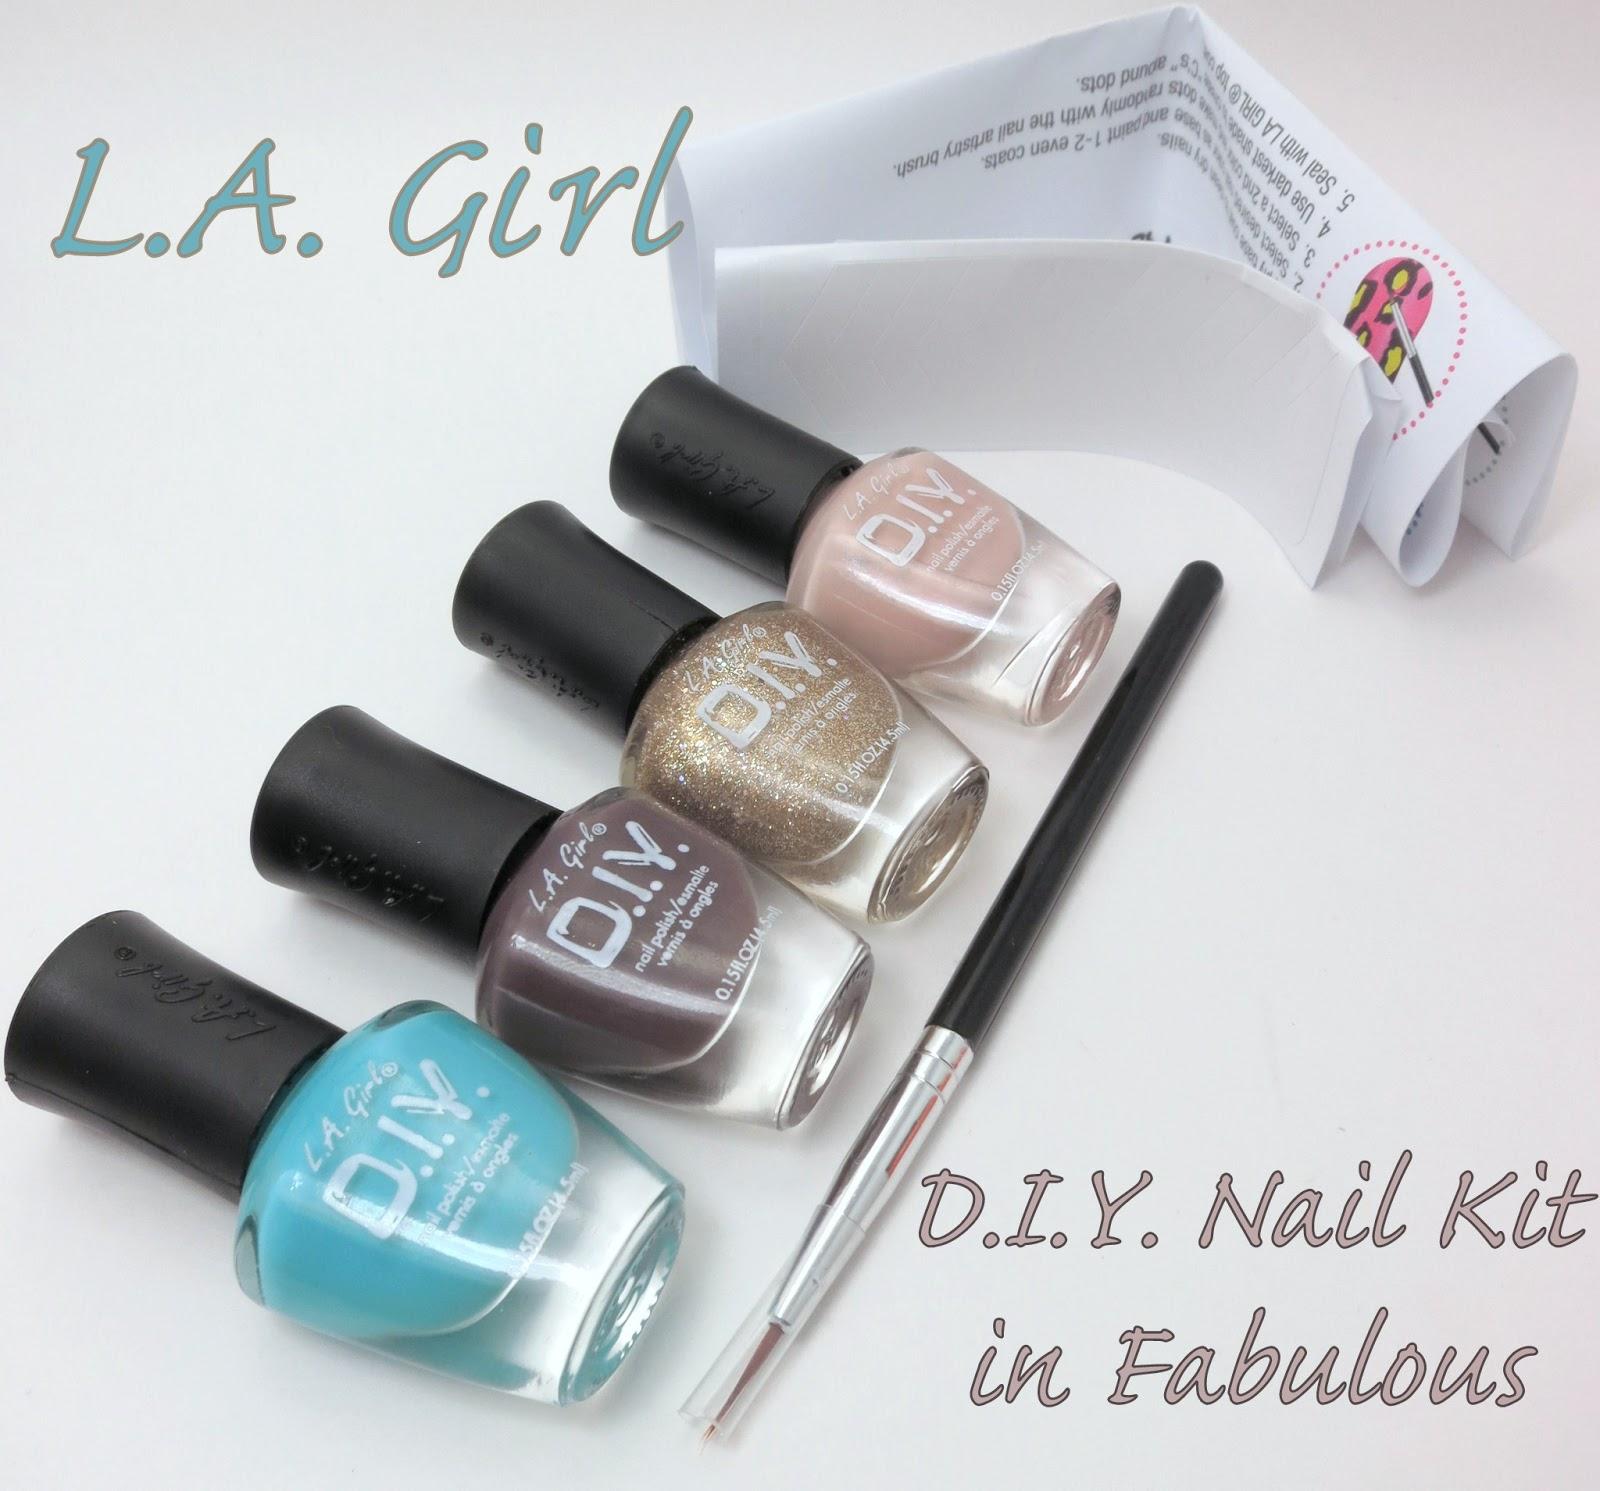 Oh Three Oh Four: L.A. Girl D.I.Y. Nail Kit in Fabulous